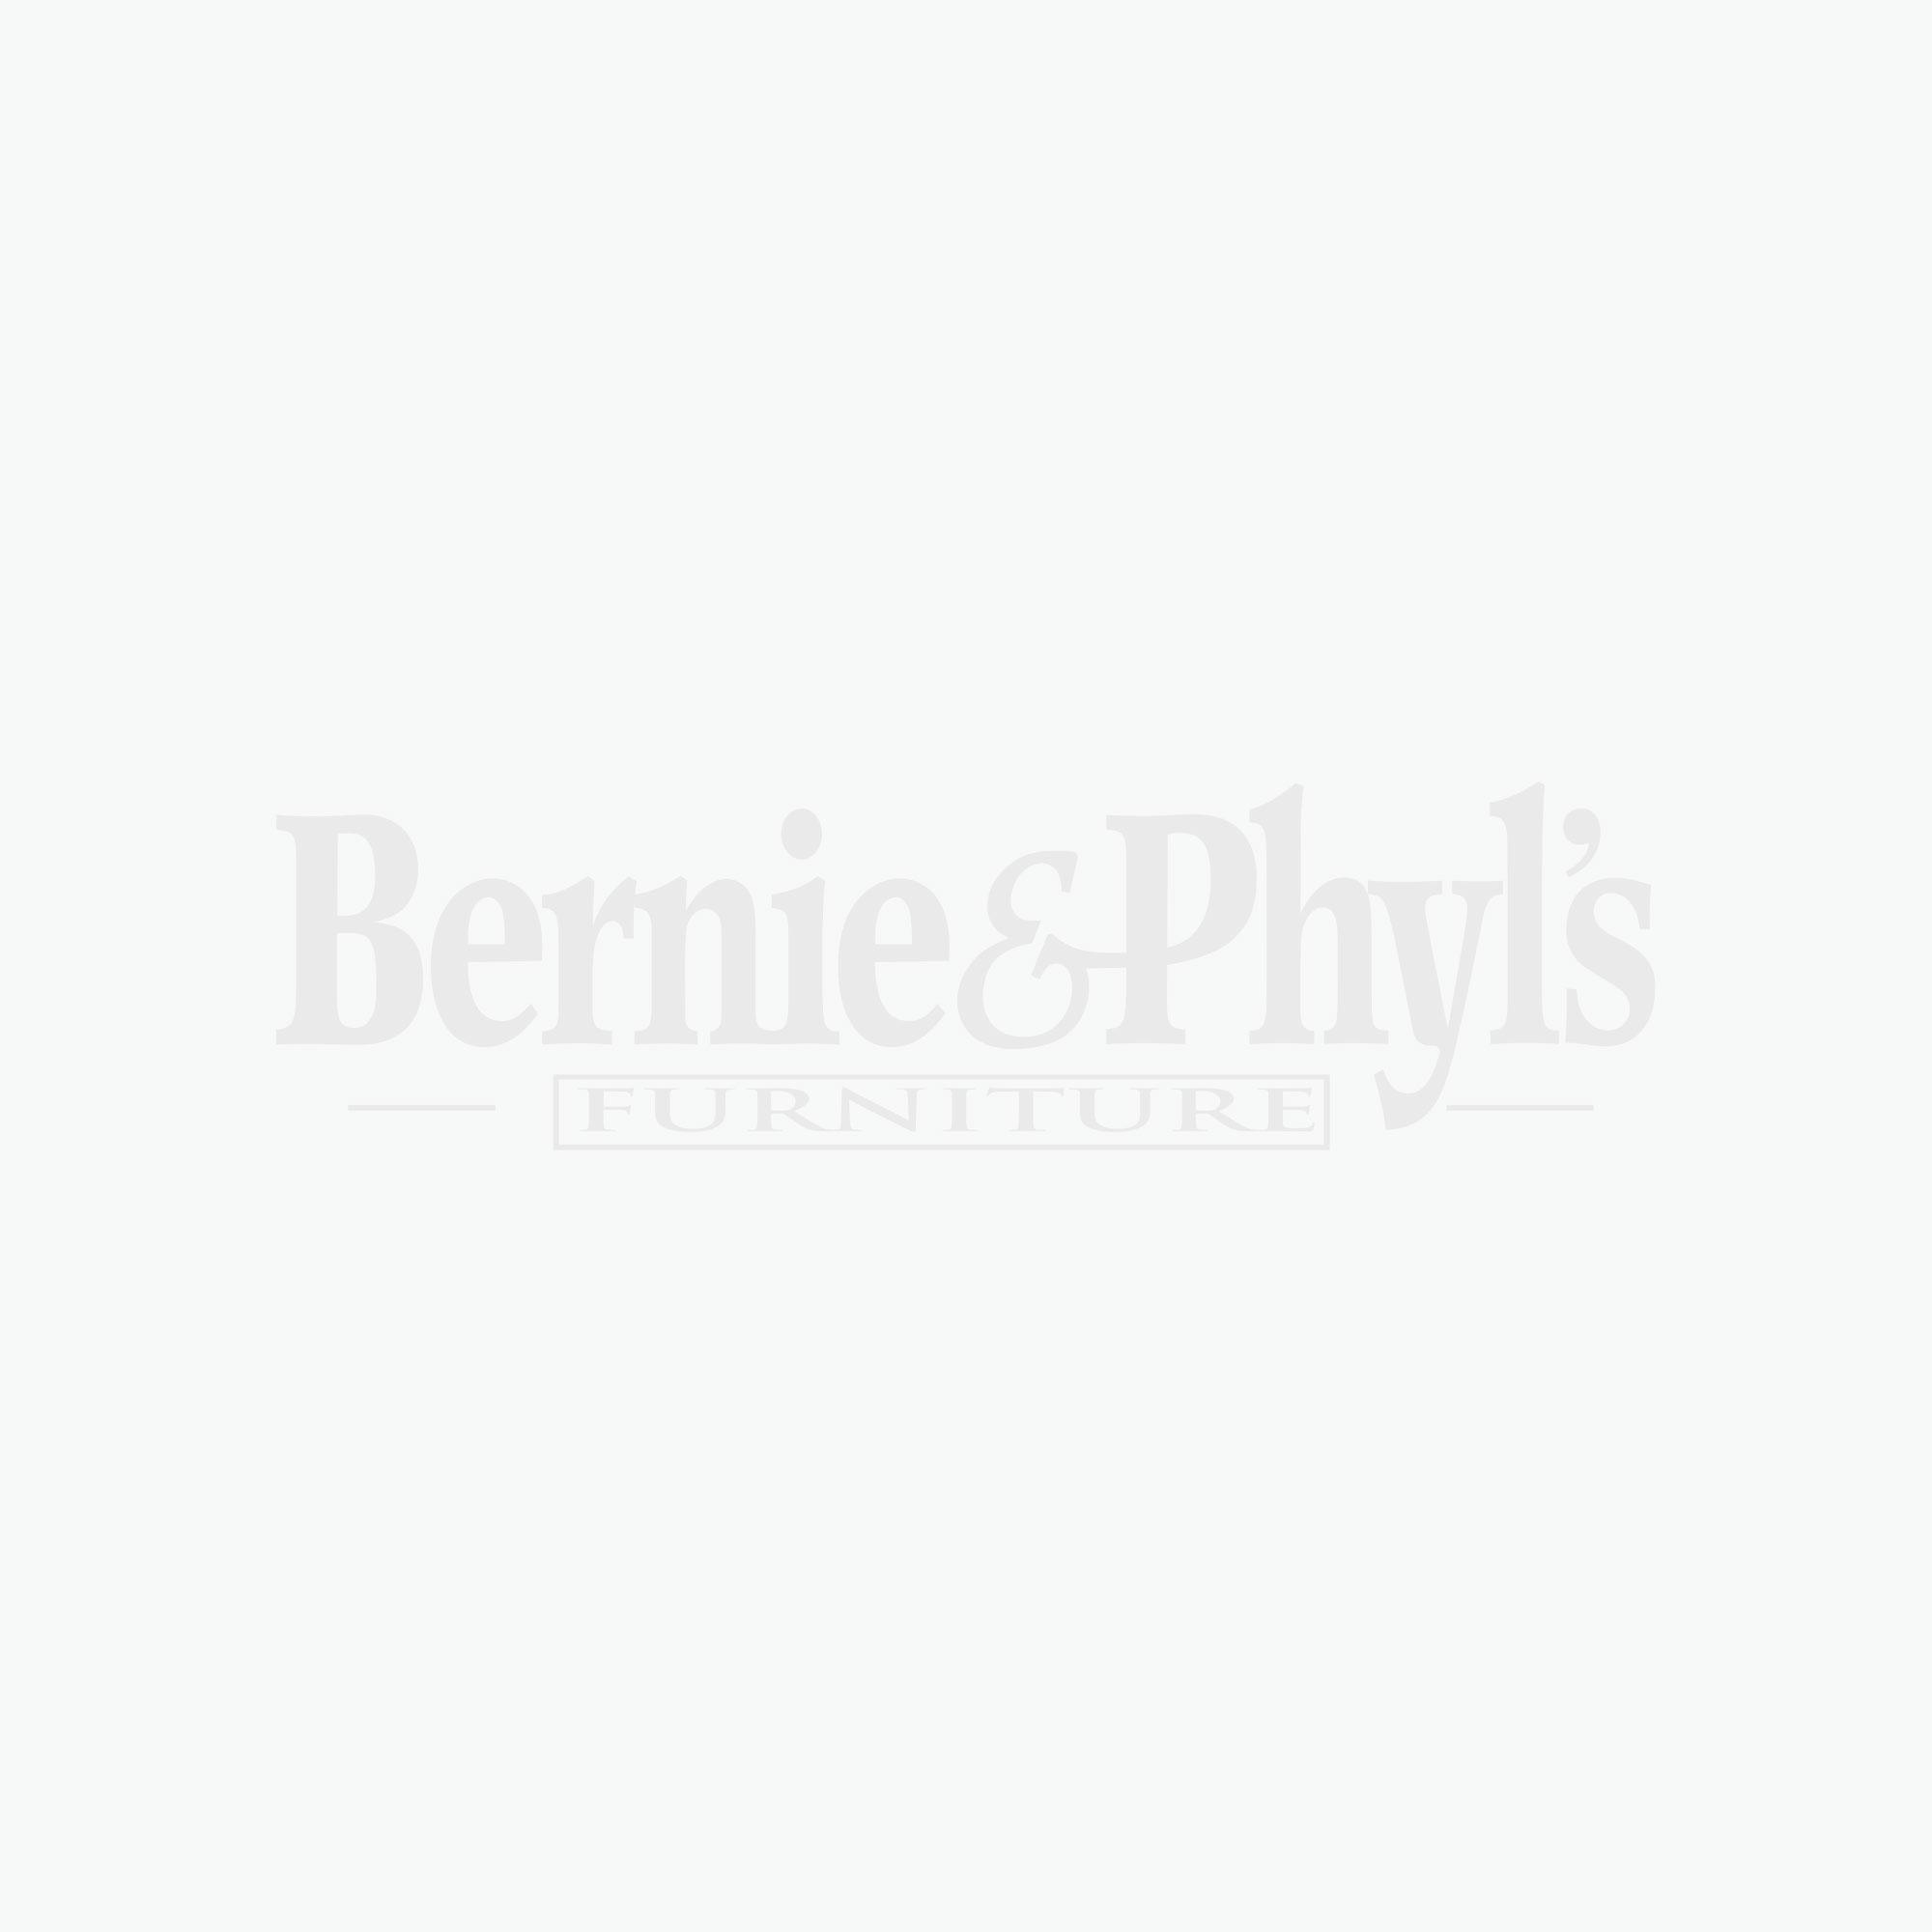 Greyson Loveseat Bernie Phyl S Furniture By Chateau D 39 Ax